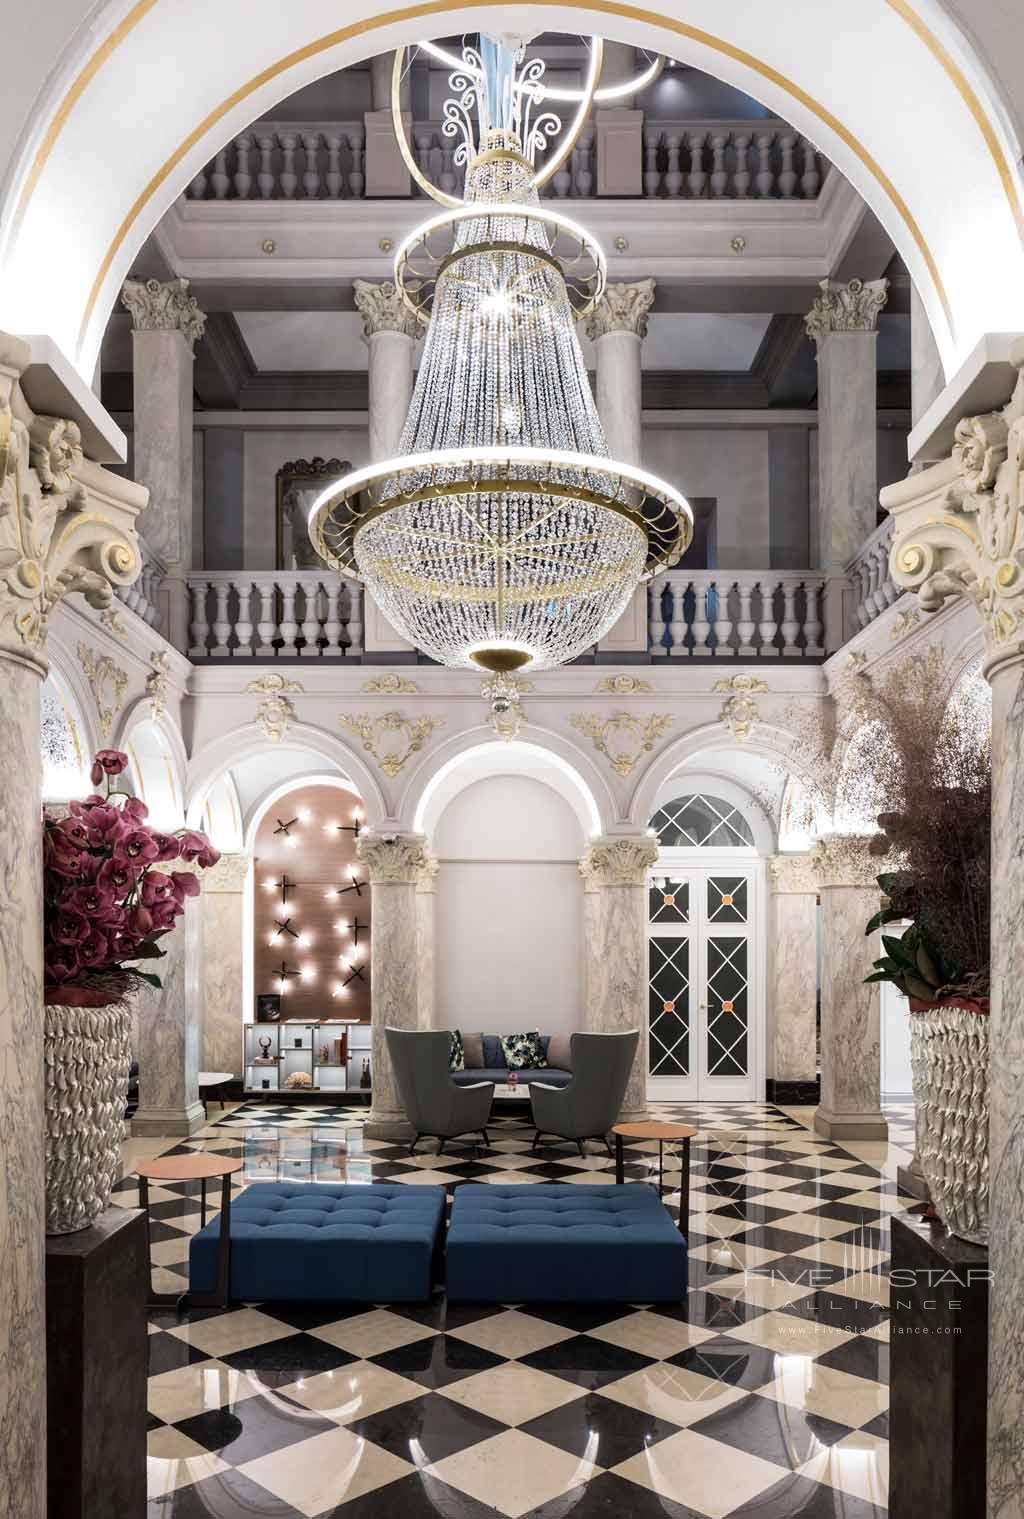 Lobby of Hotel de la Paix Geneva, Geneve, Switzerland